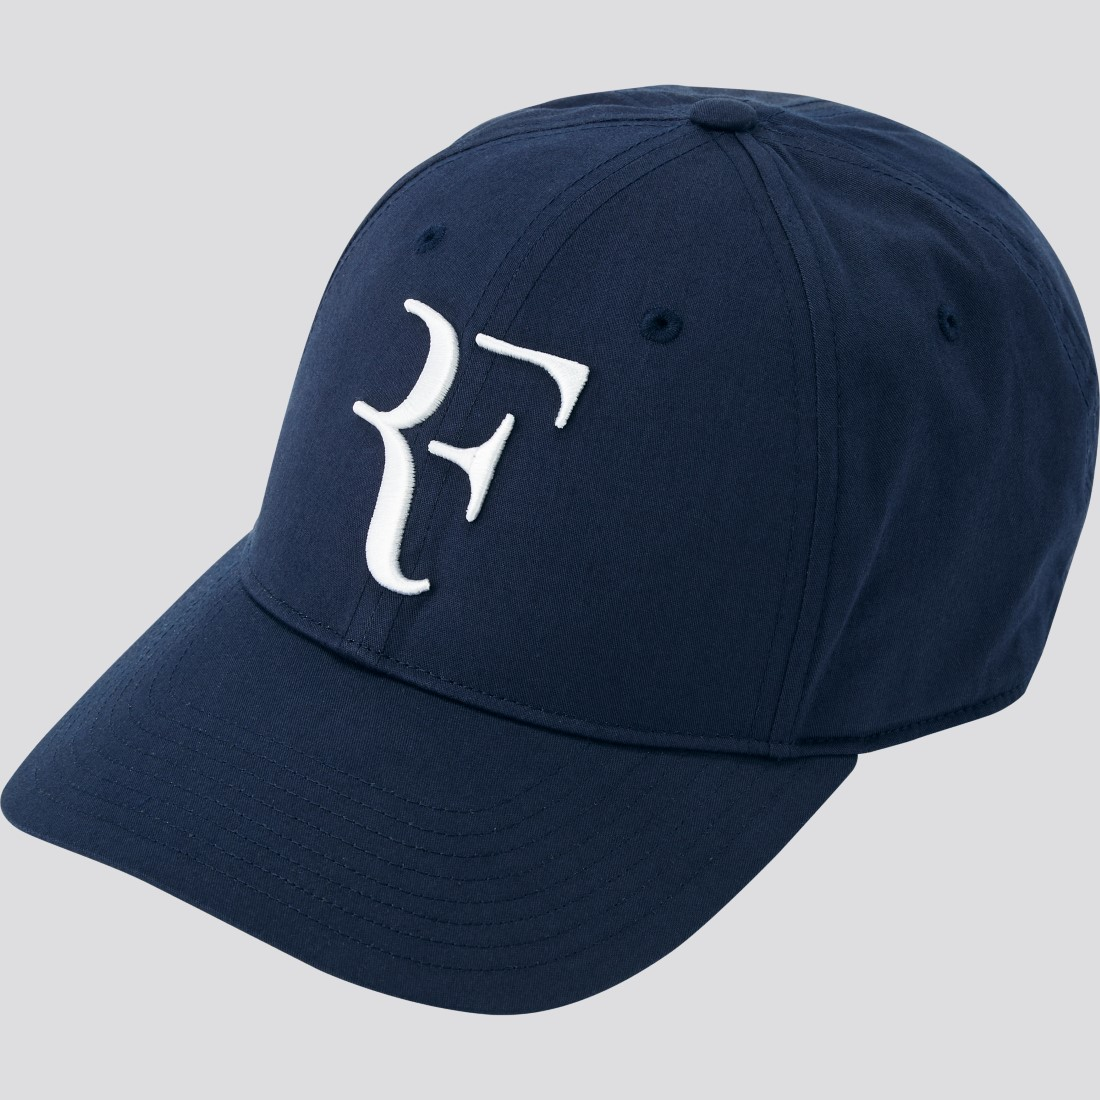 UNIQLO - Casquettes RF Roger Federer